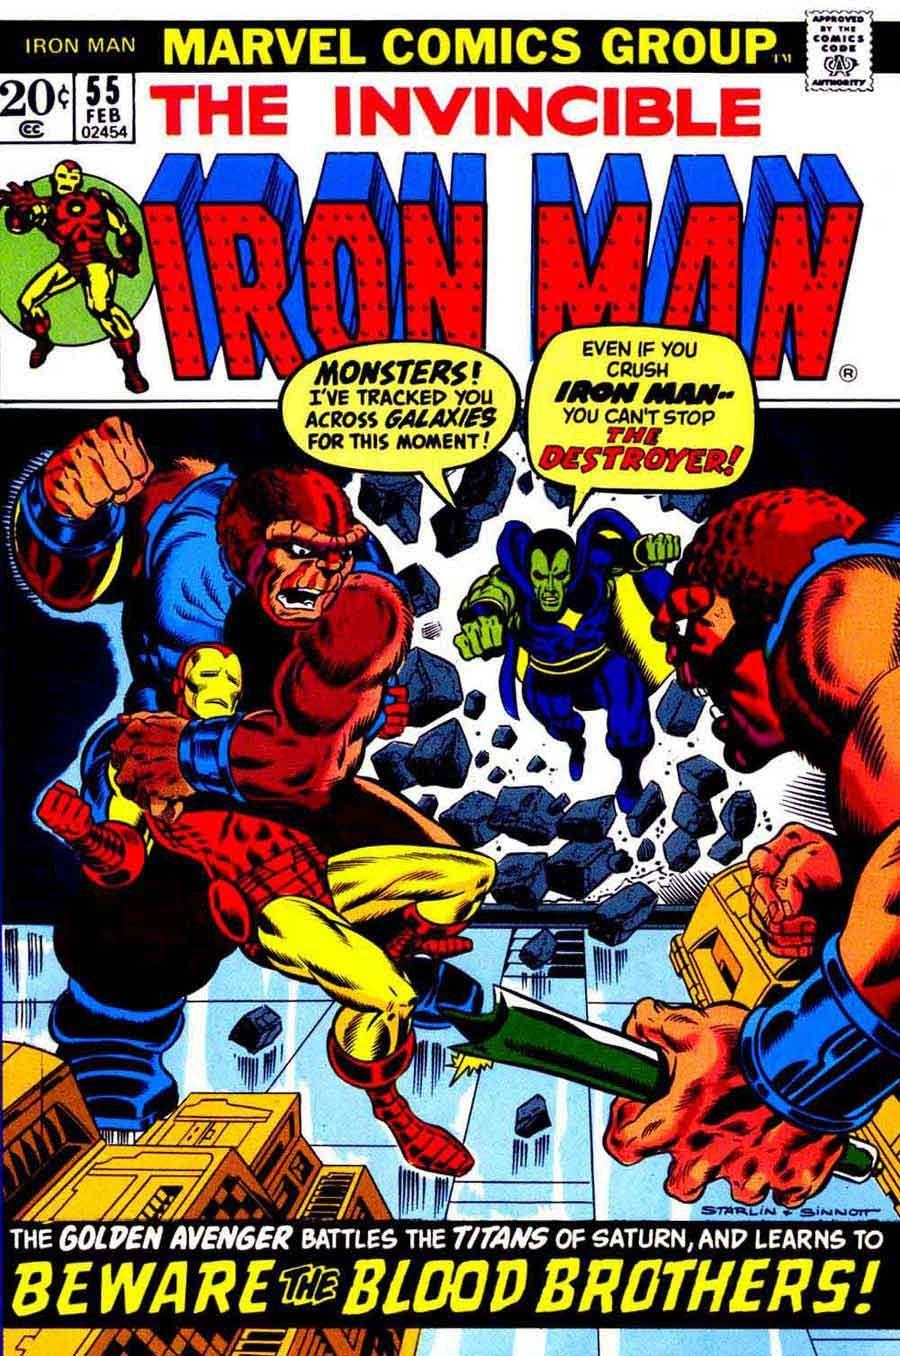 Iron Man 55 Jim Starlin art & cover First Thanos